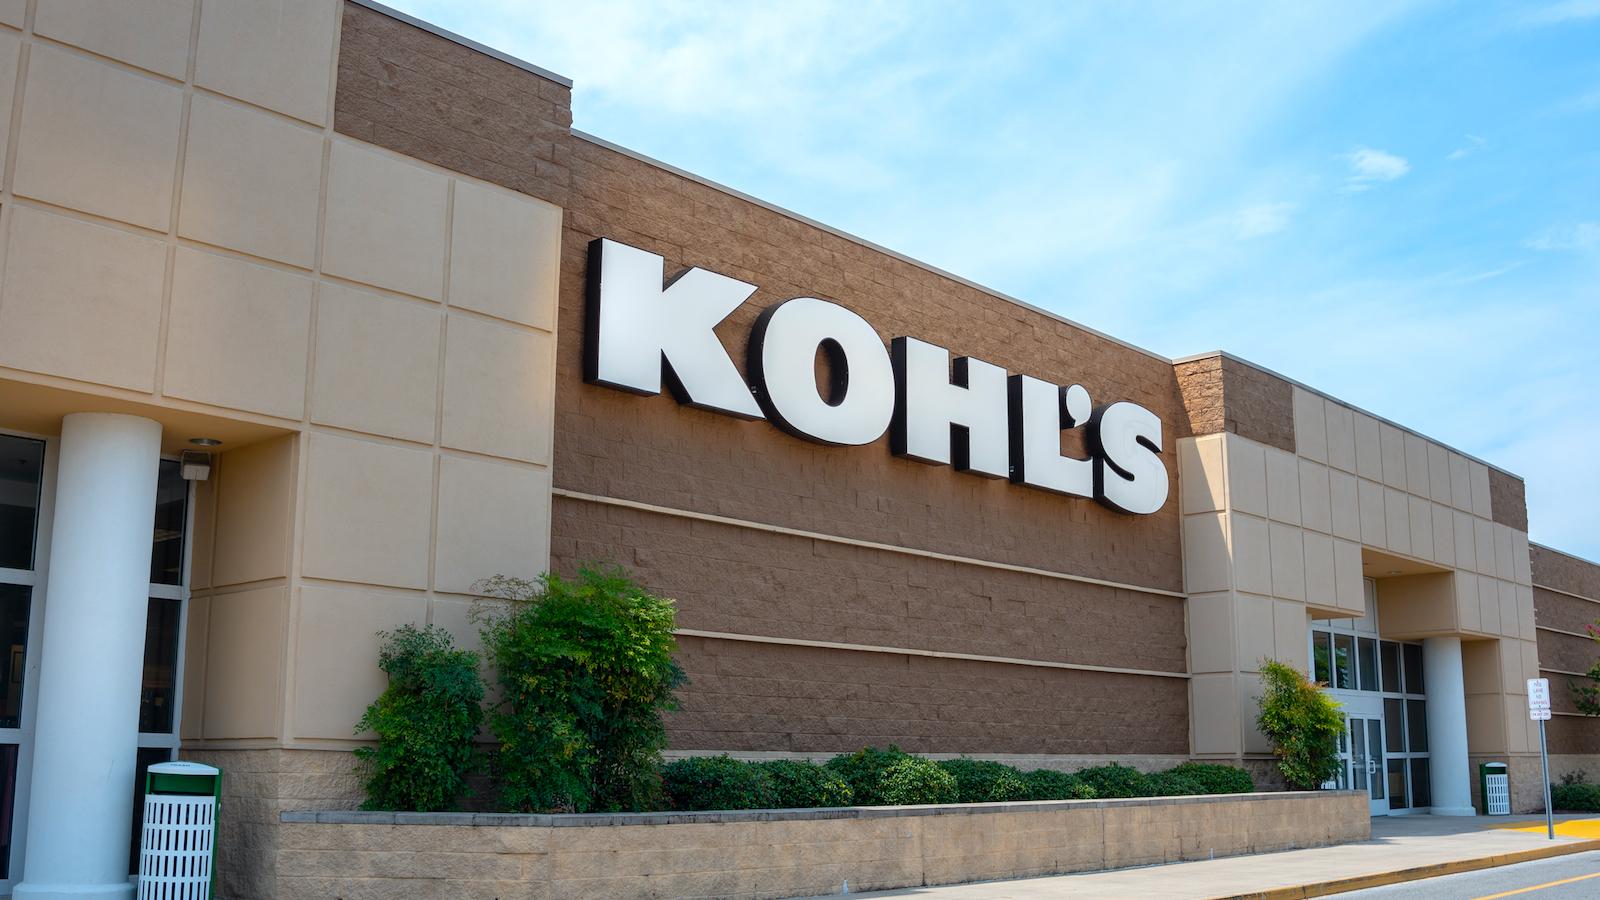 Kohl,Michelle,Andy Serwer,Wisconsin,Menomonee Falls,Mandy,Kohls,United States